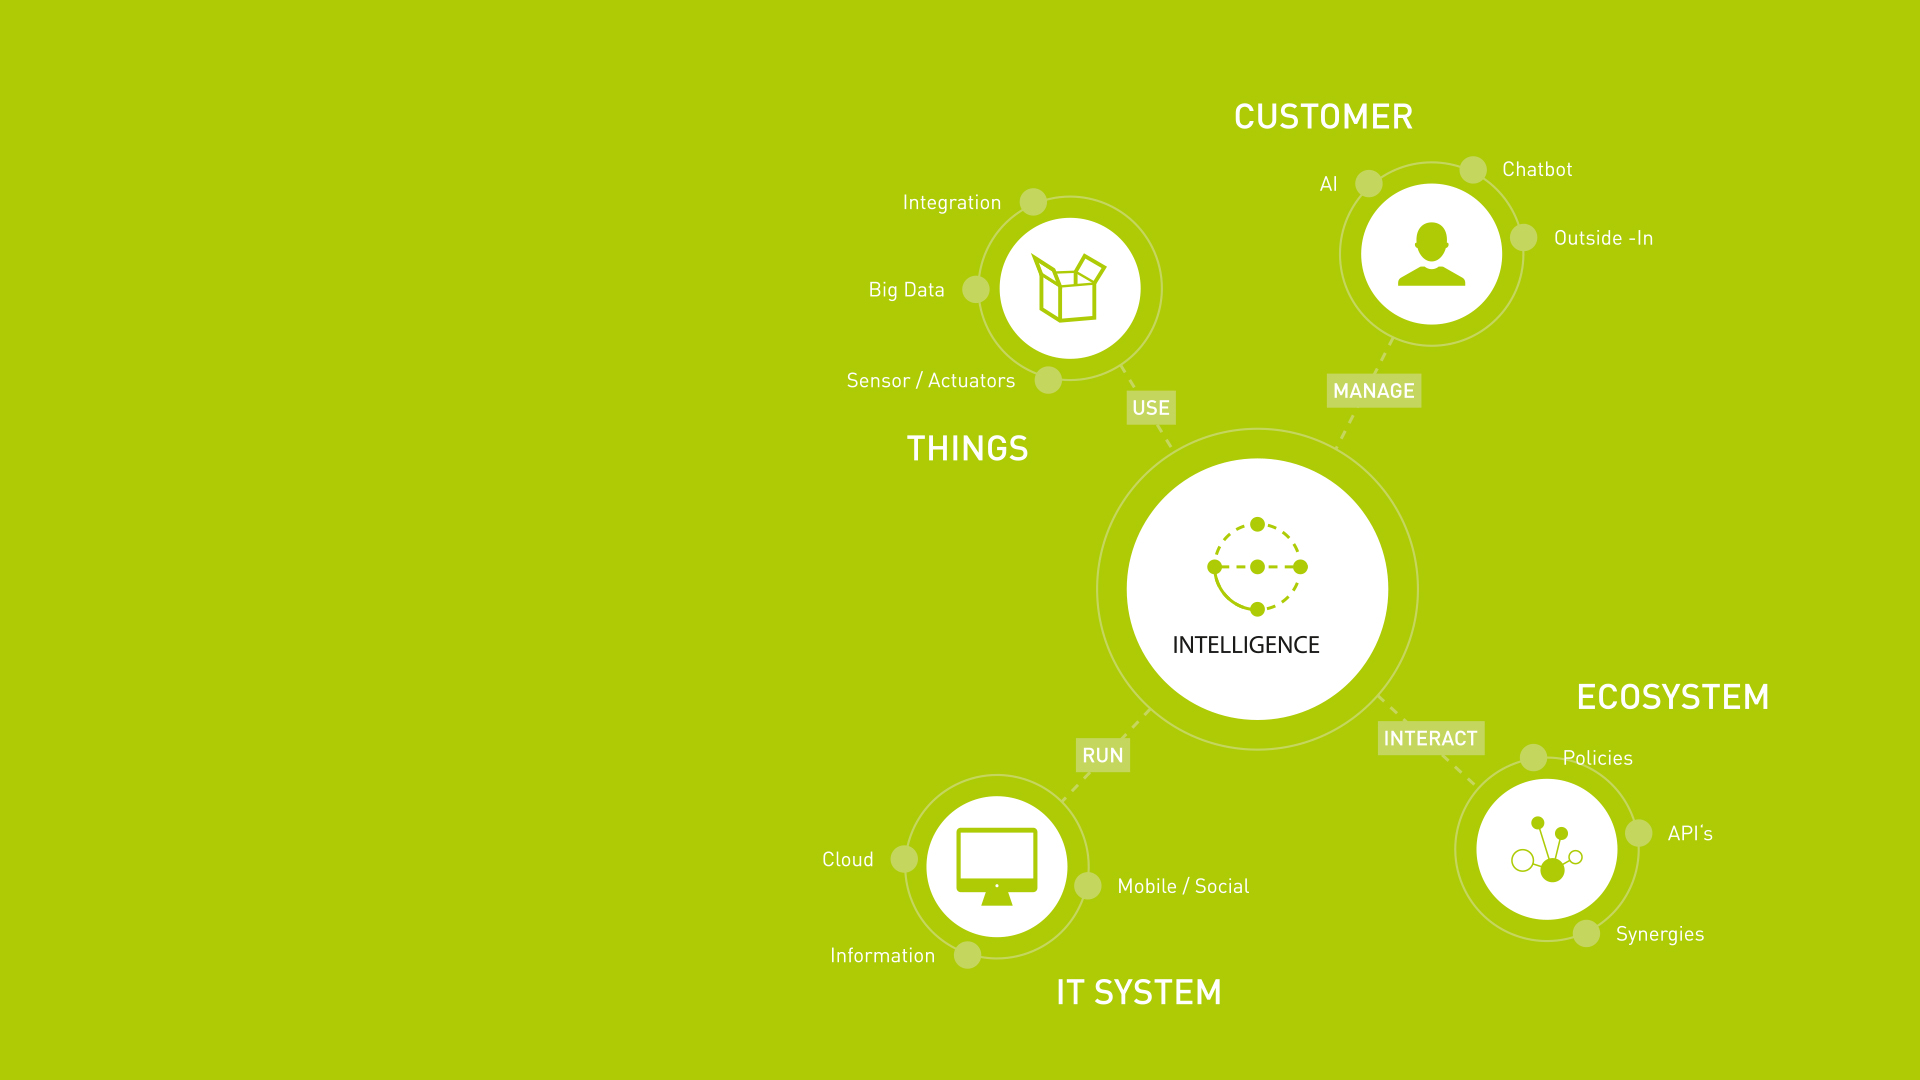 Axon Ivy Mindmap Intelligence, Customer, Things, IT System, Ecosystem